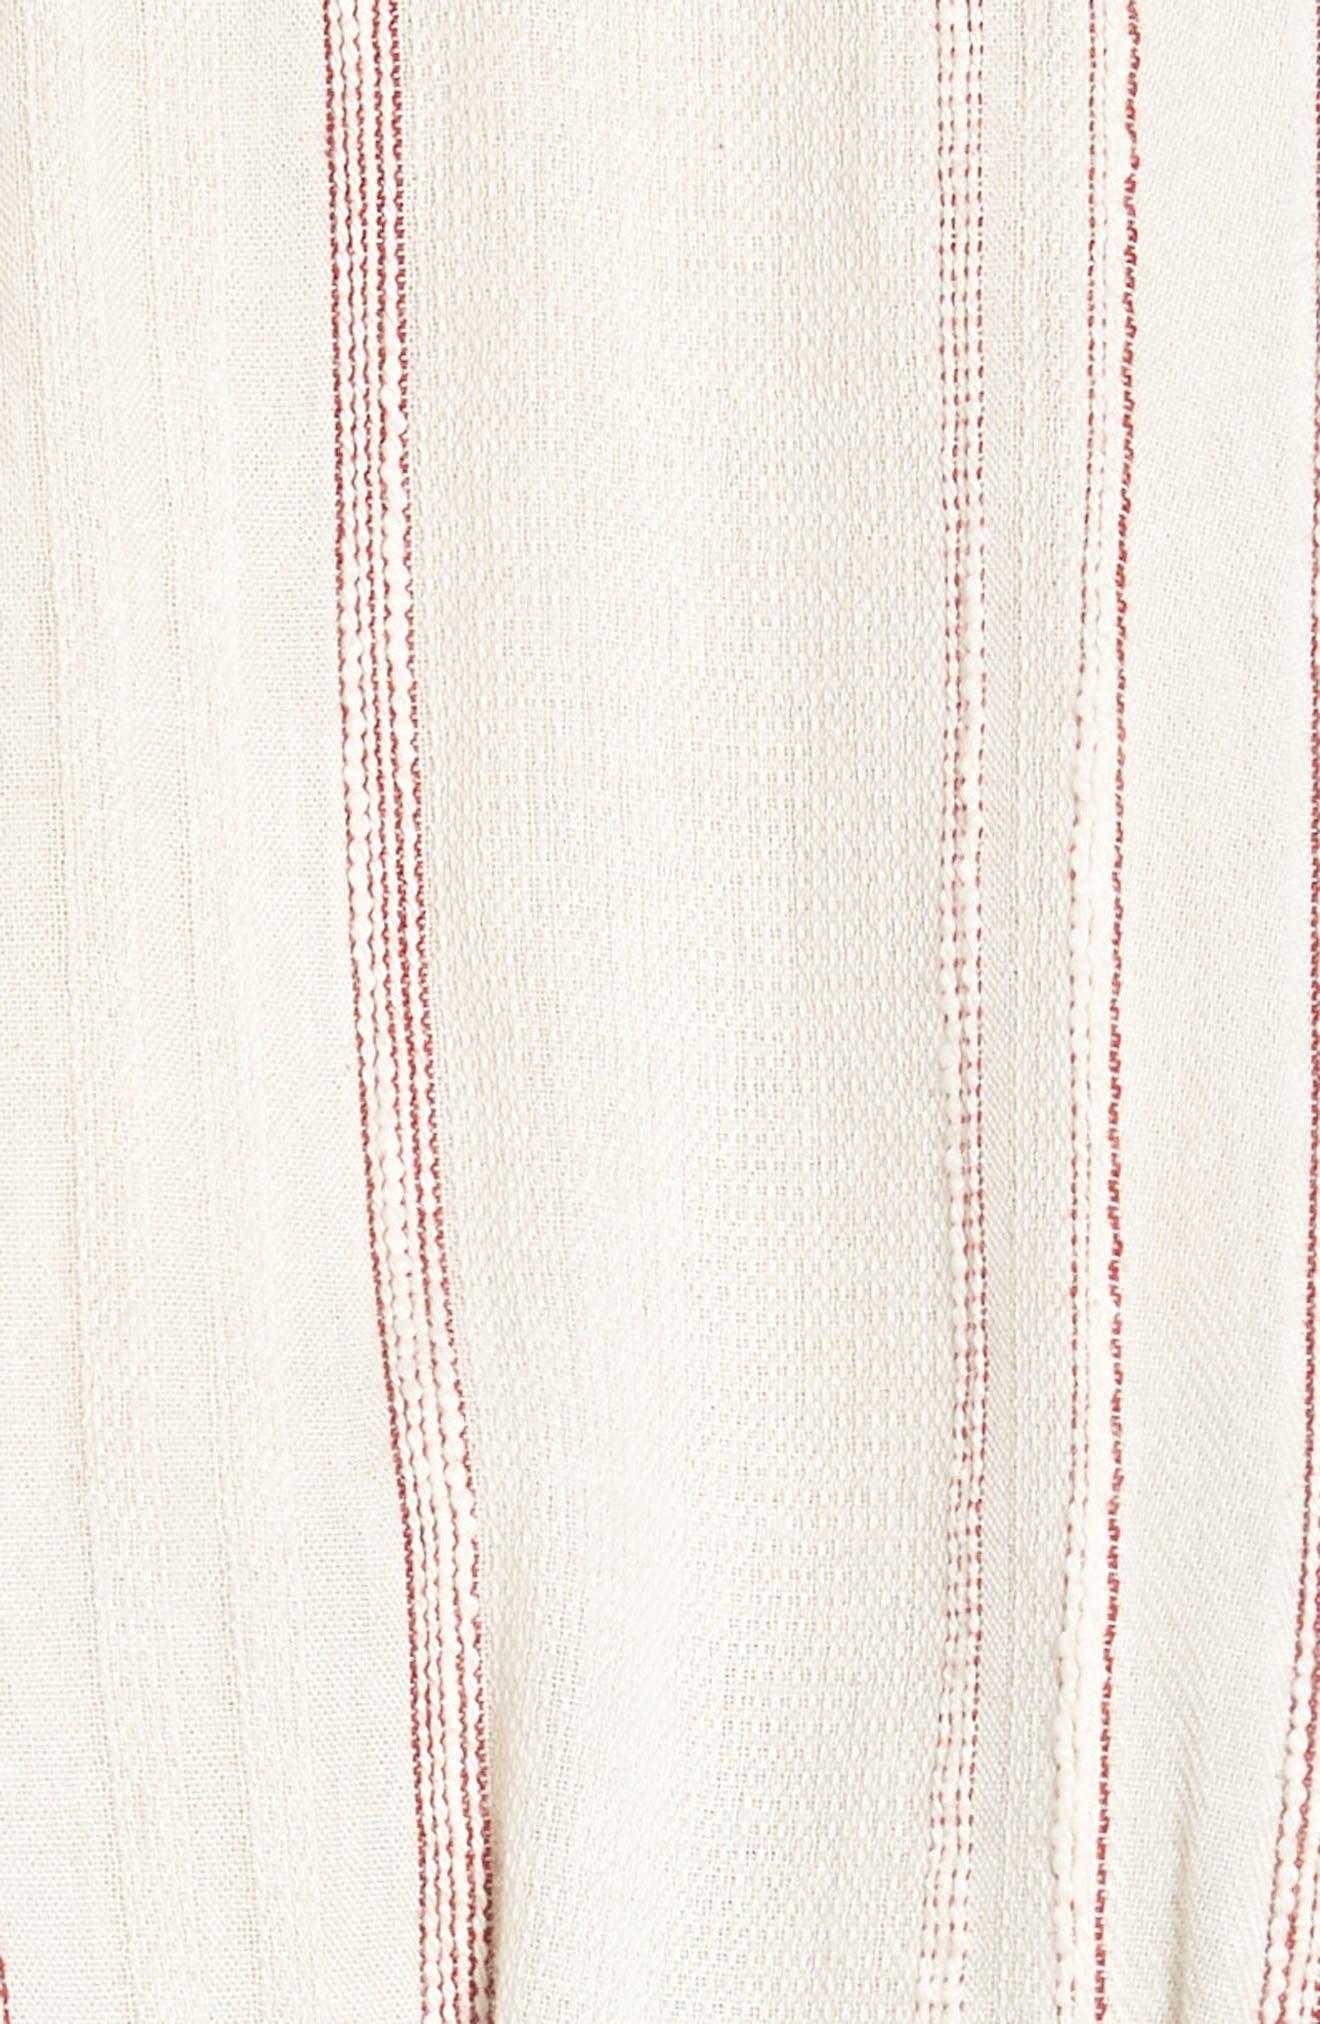 Marian Stripe Ruffle Minidress,                             Alternate thumbnail 7, color,                             Red/ Natural